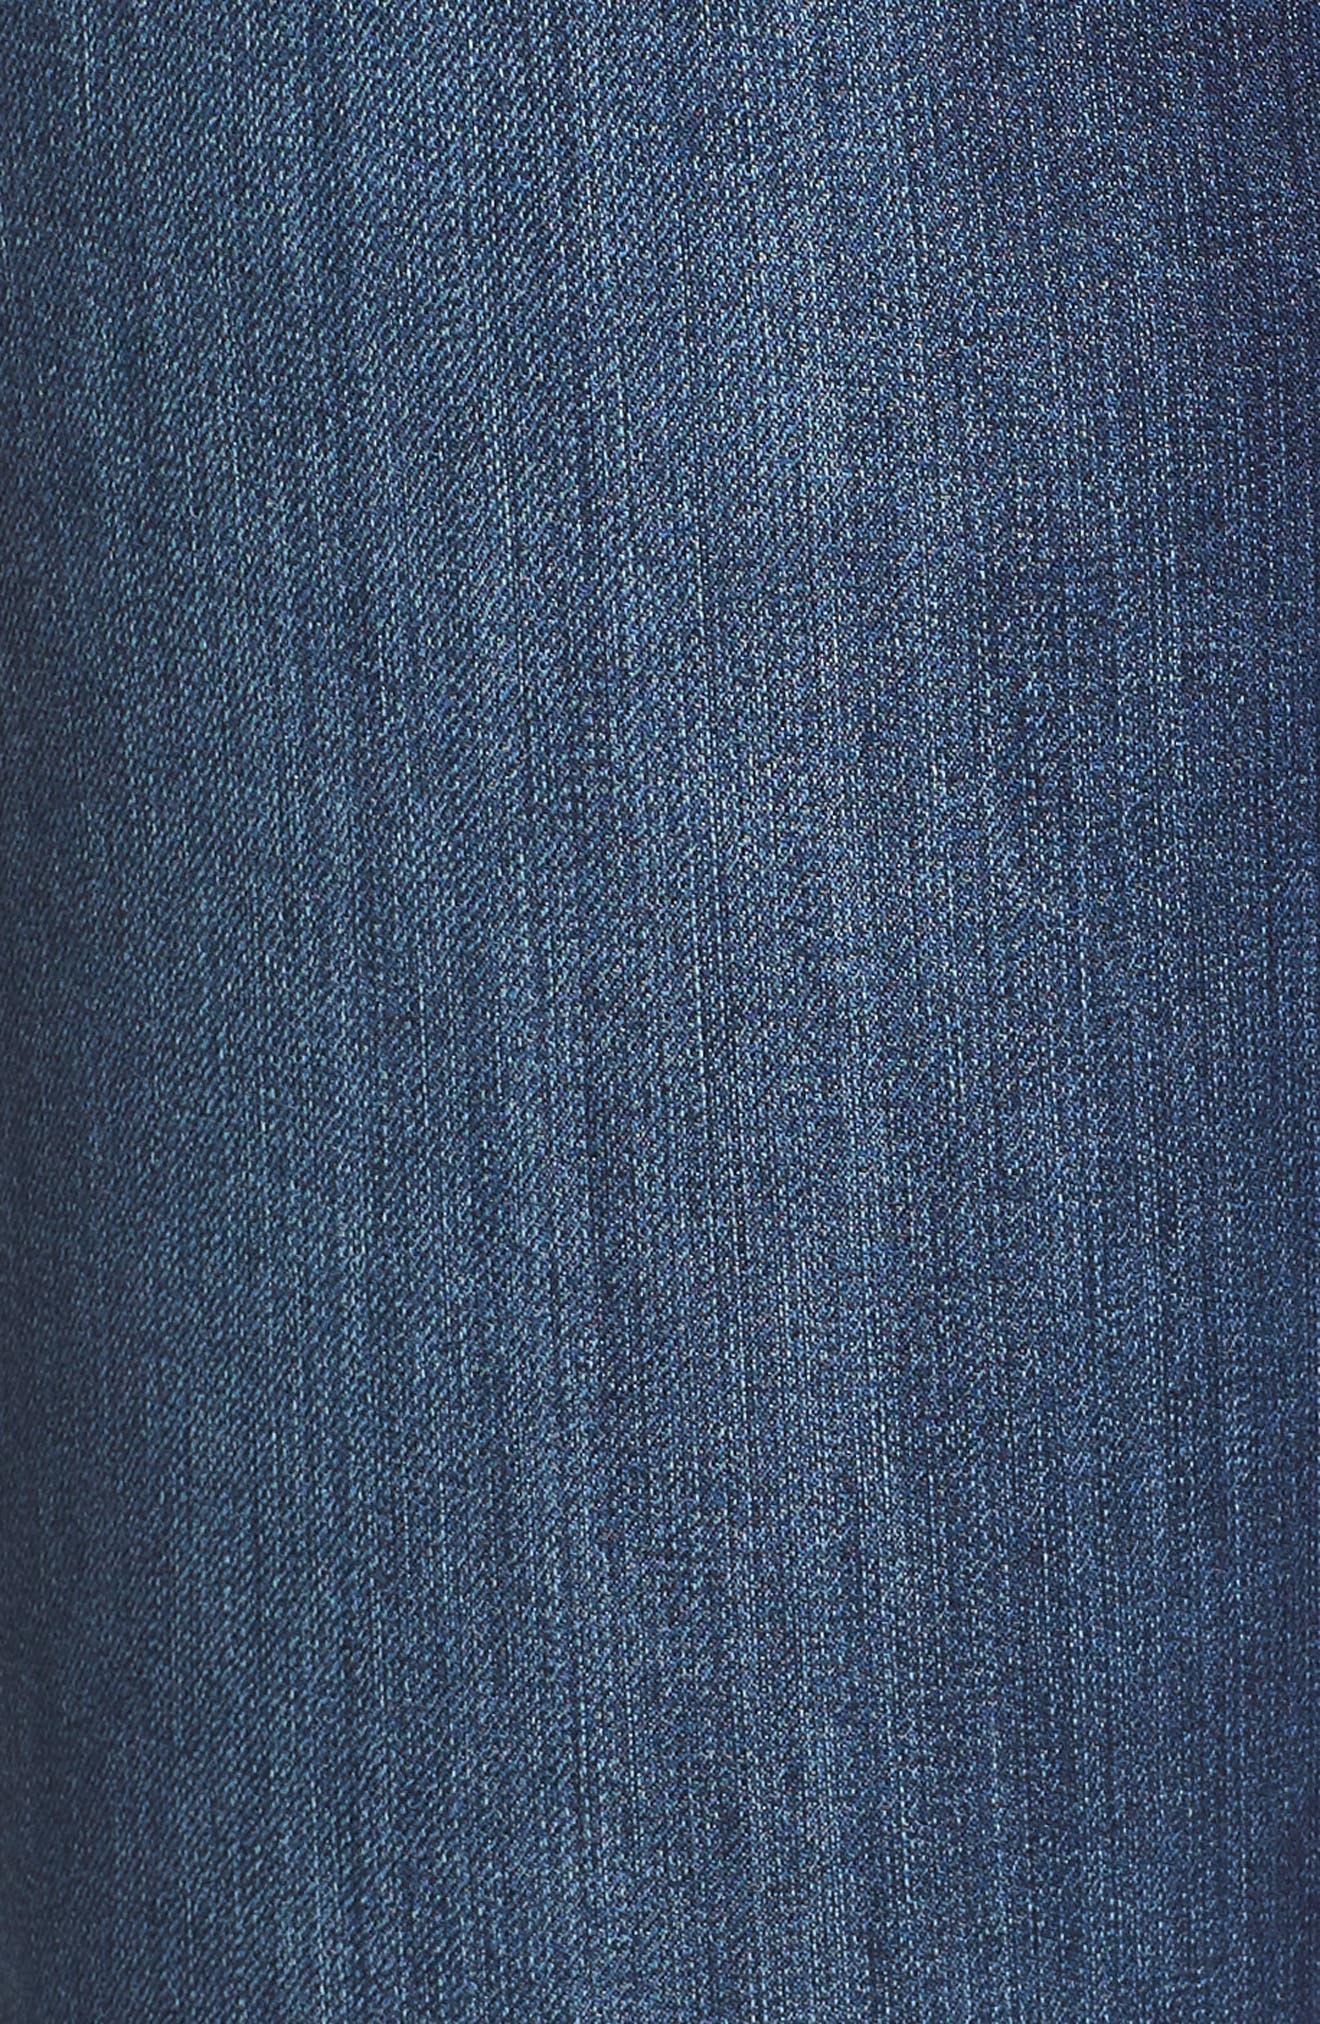 SEVEN7, Rocker Flap Pocket Slim Bootcut Jeans, Alternate thumbnail 6, color, CHALLENGER